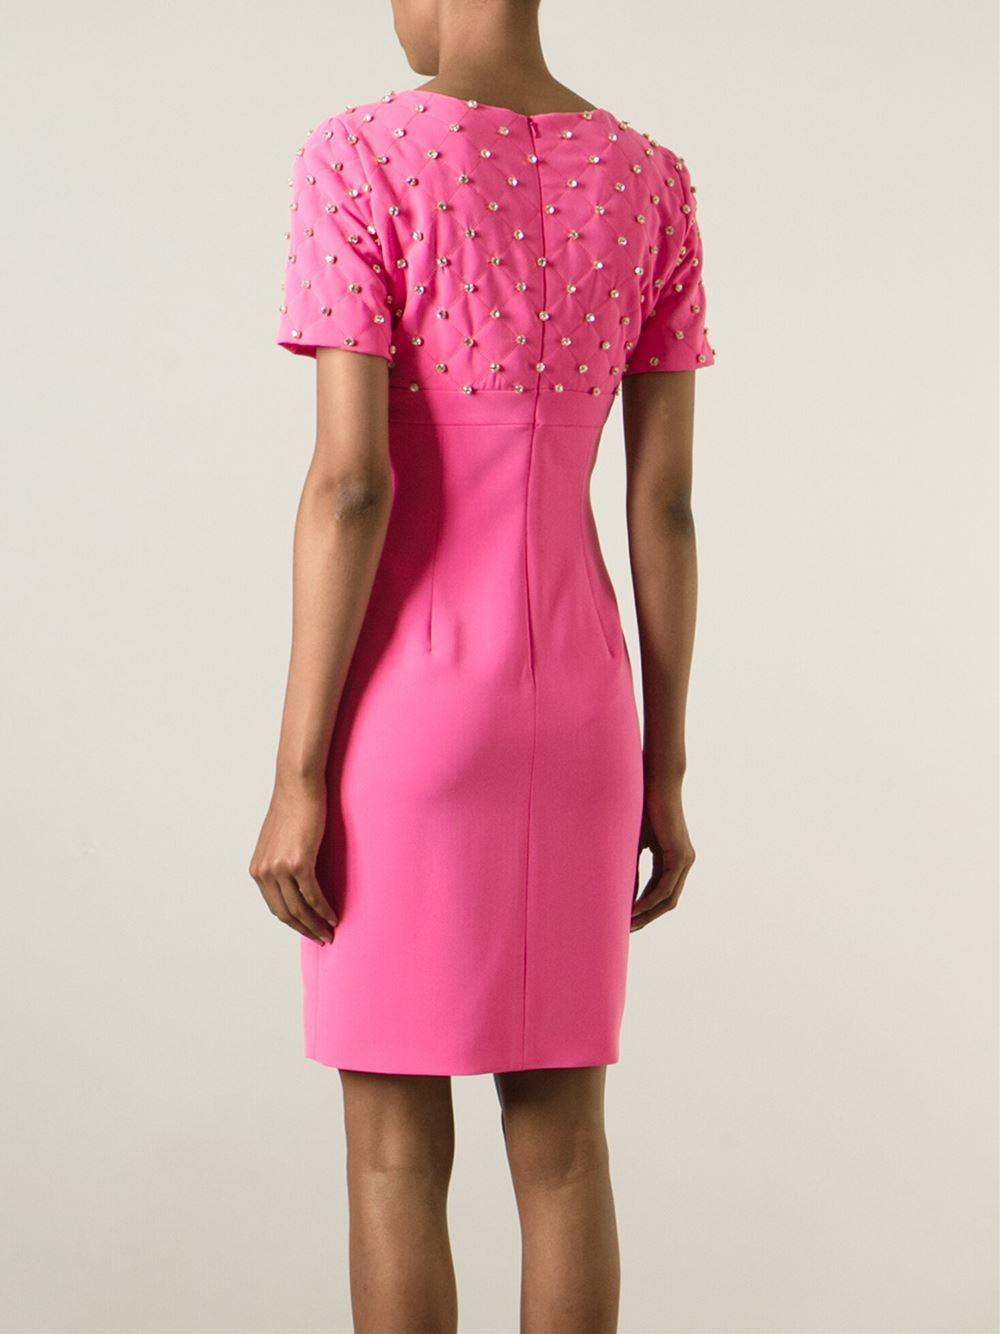 Moschino Embellished Dress Lyst